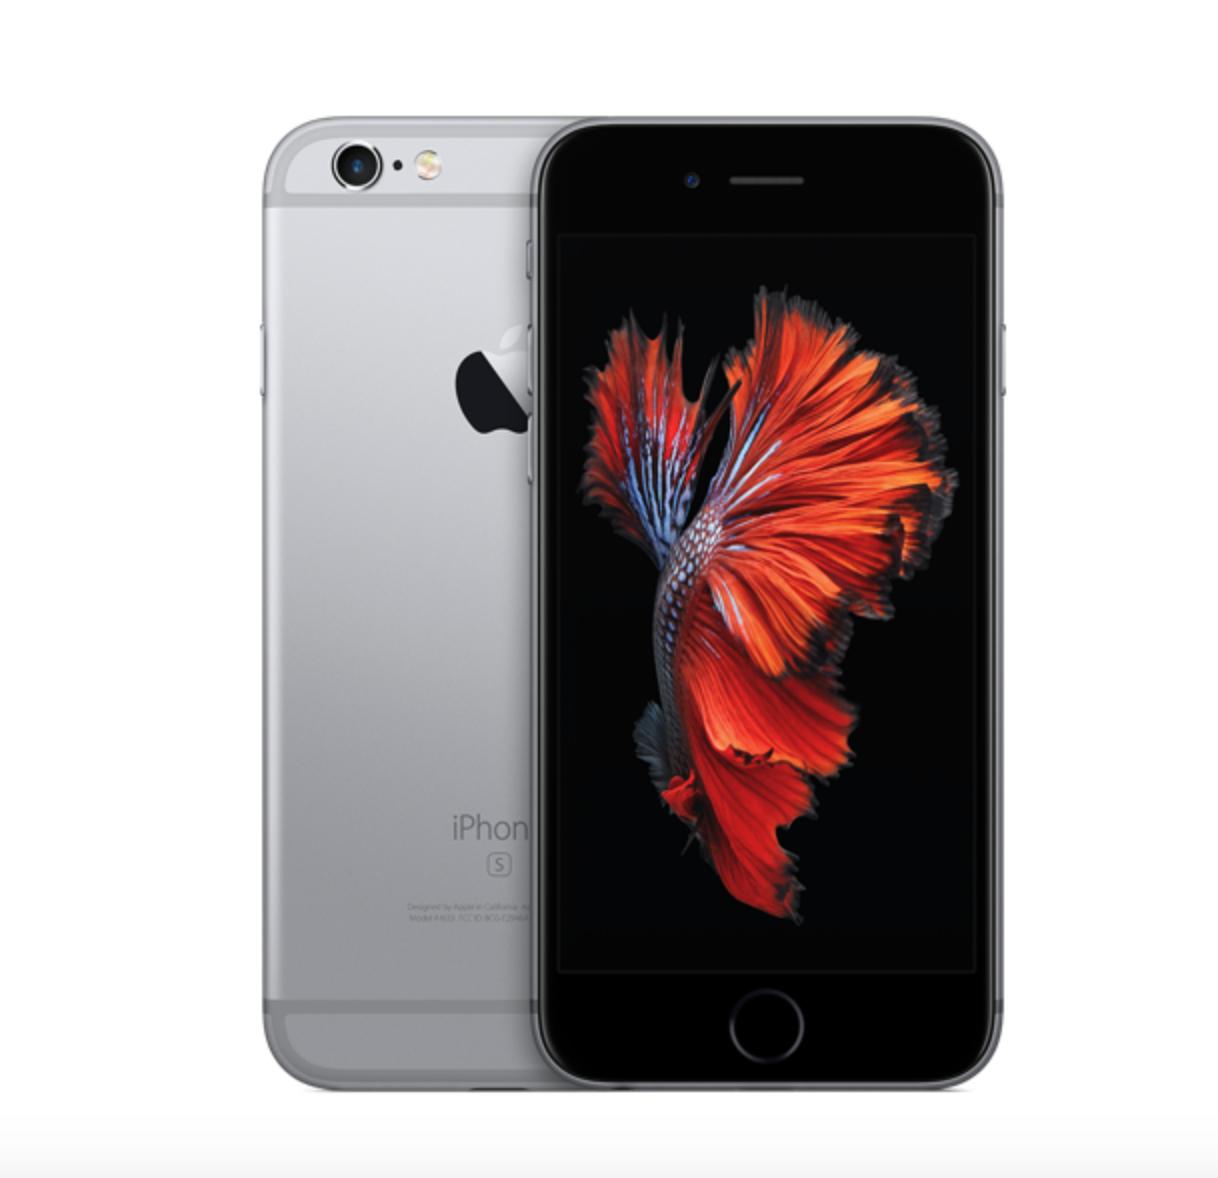 iPhone 6S - Bản Quốc Tế - Likenew 99%